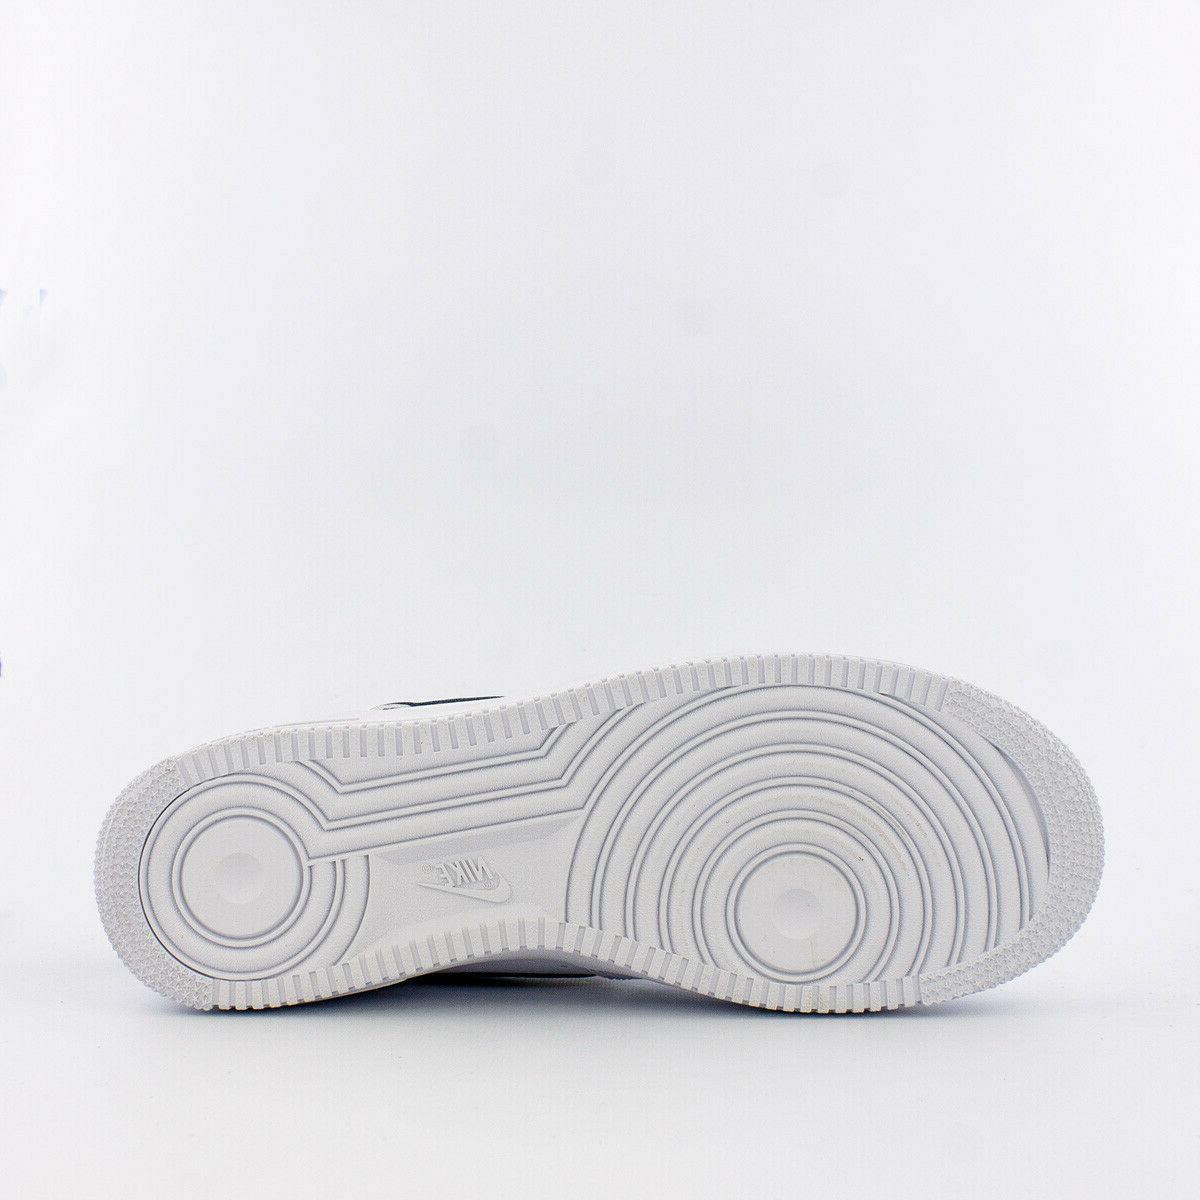 Men's Air Force 1 Basketball Shoes CJ1607-100 White/Navy